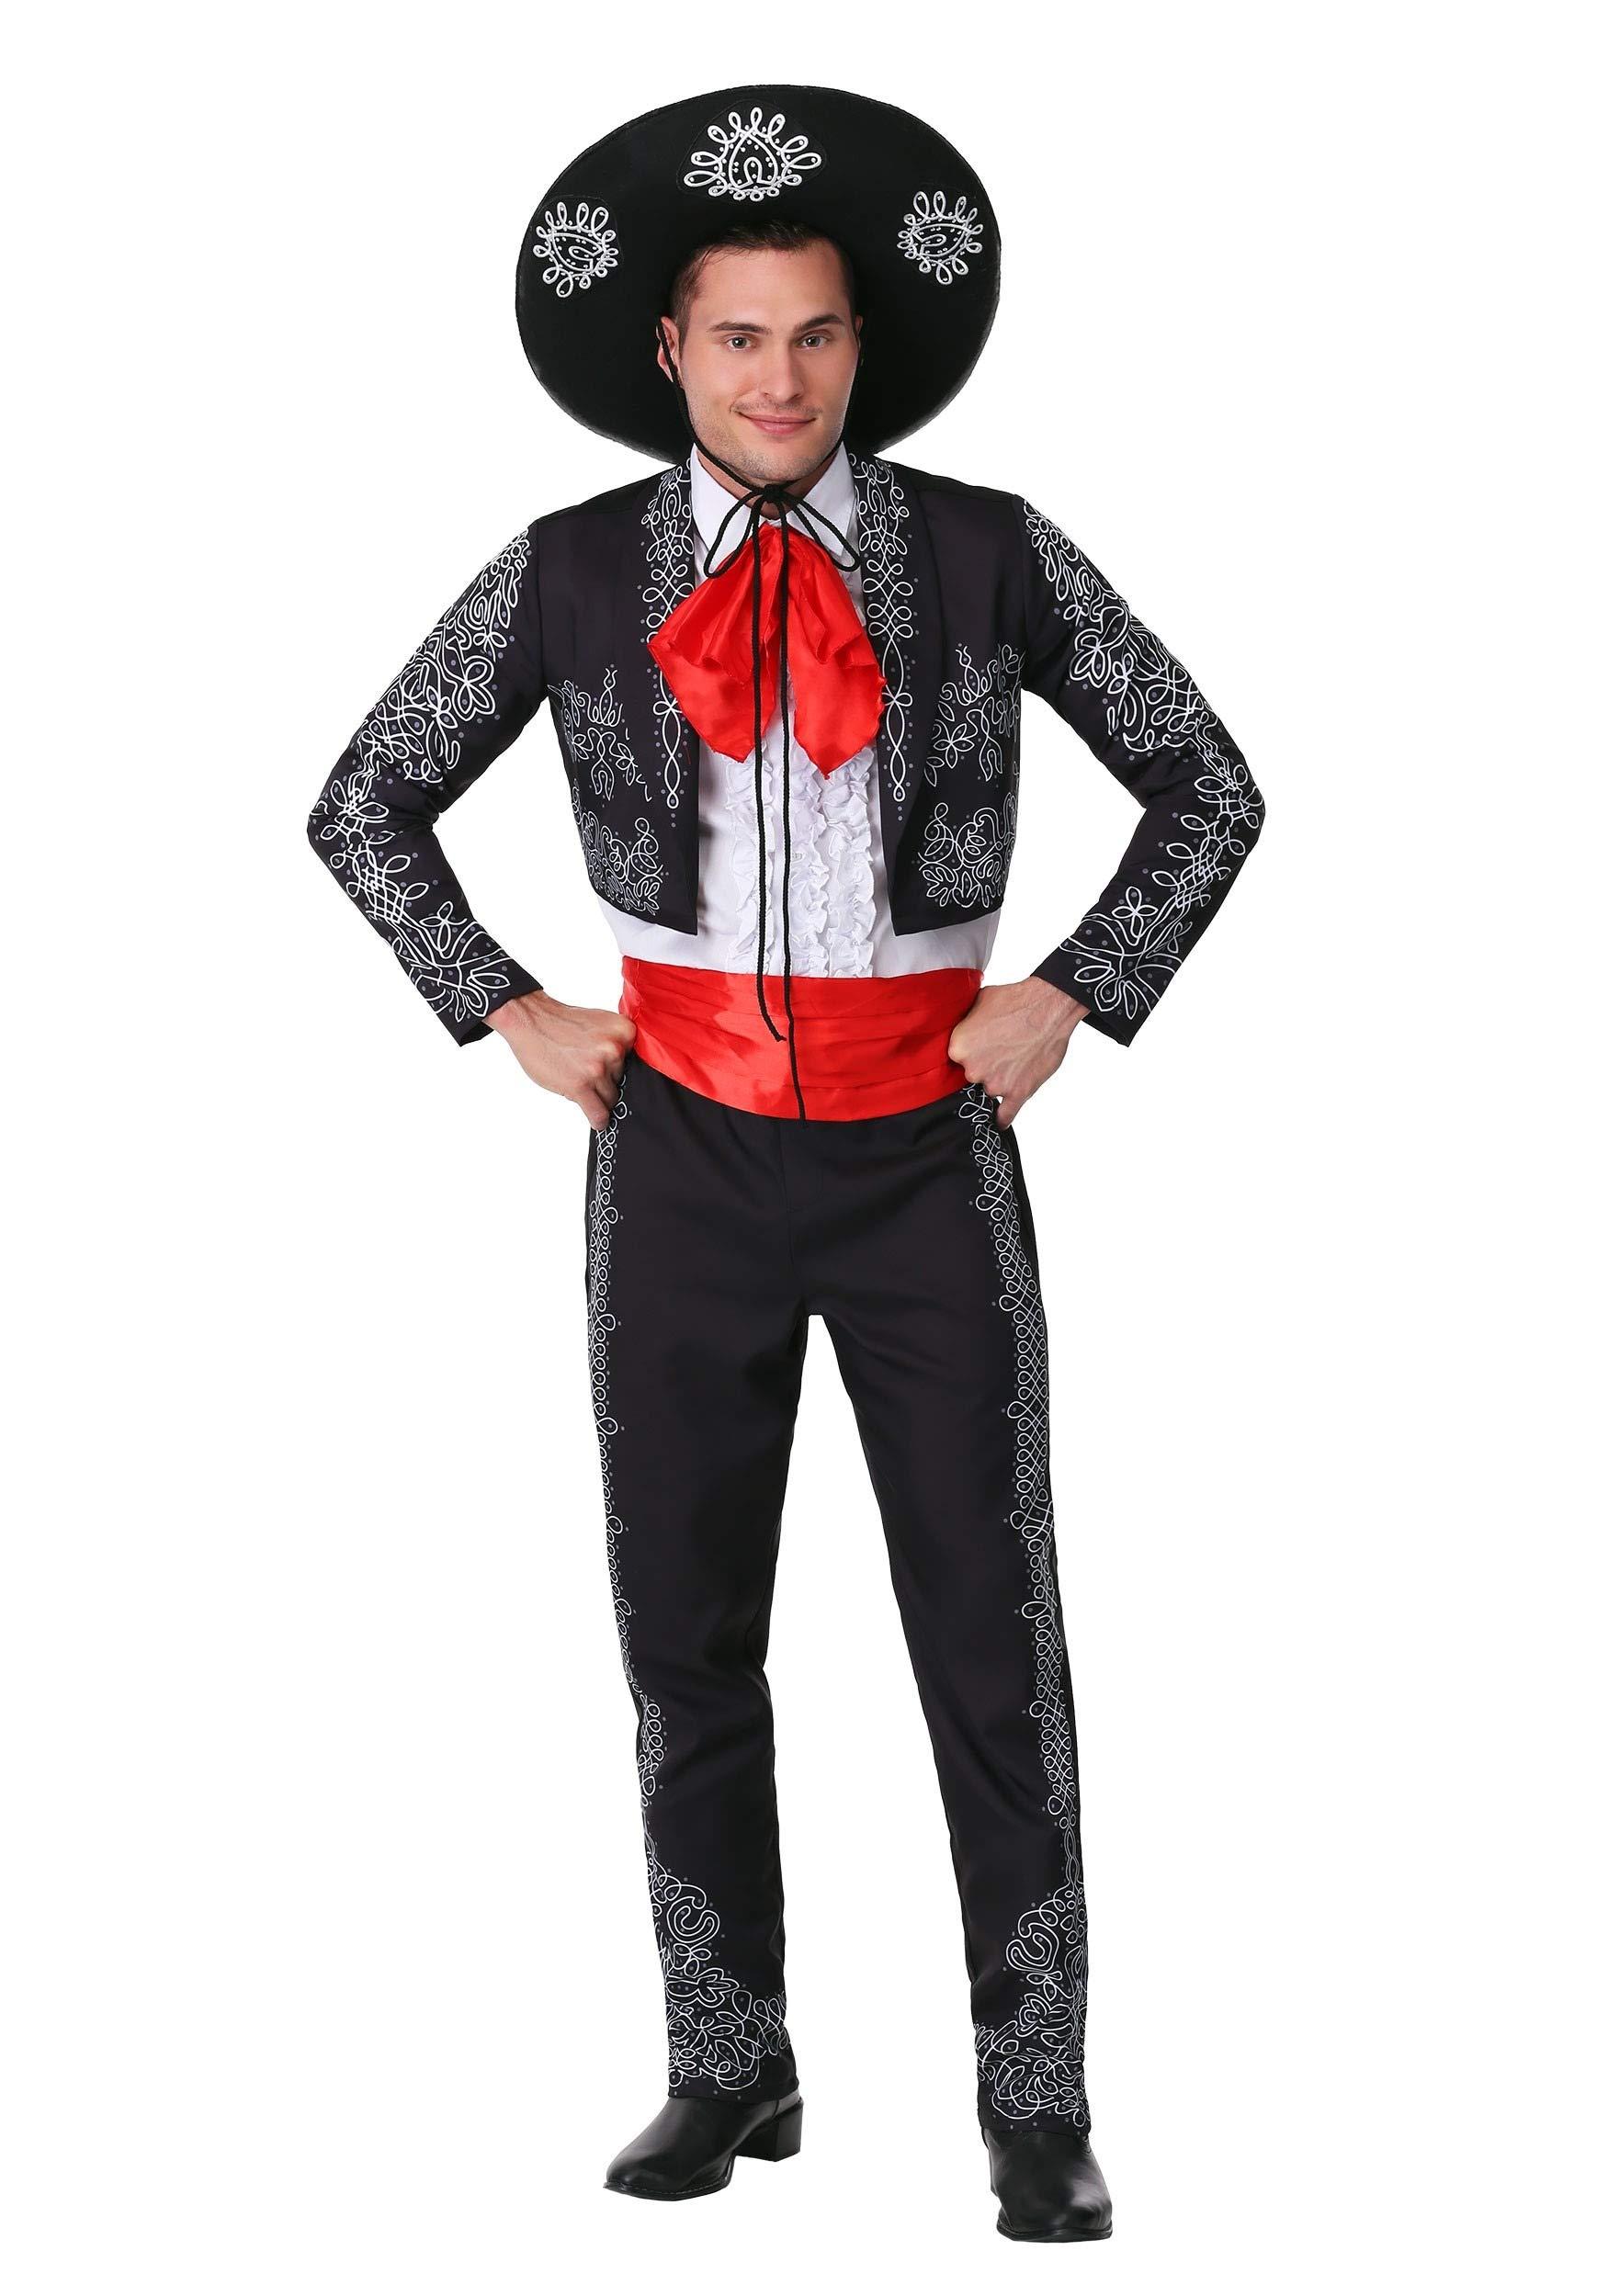 Adult Three Amigos Costume Men's Black Mariachi Suit Costume with Mexican Sombrero